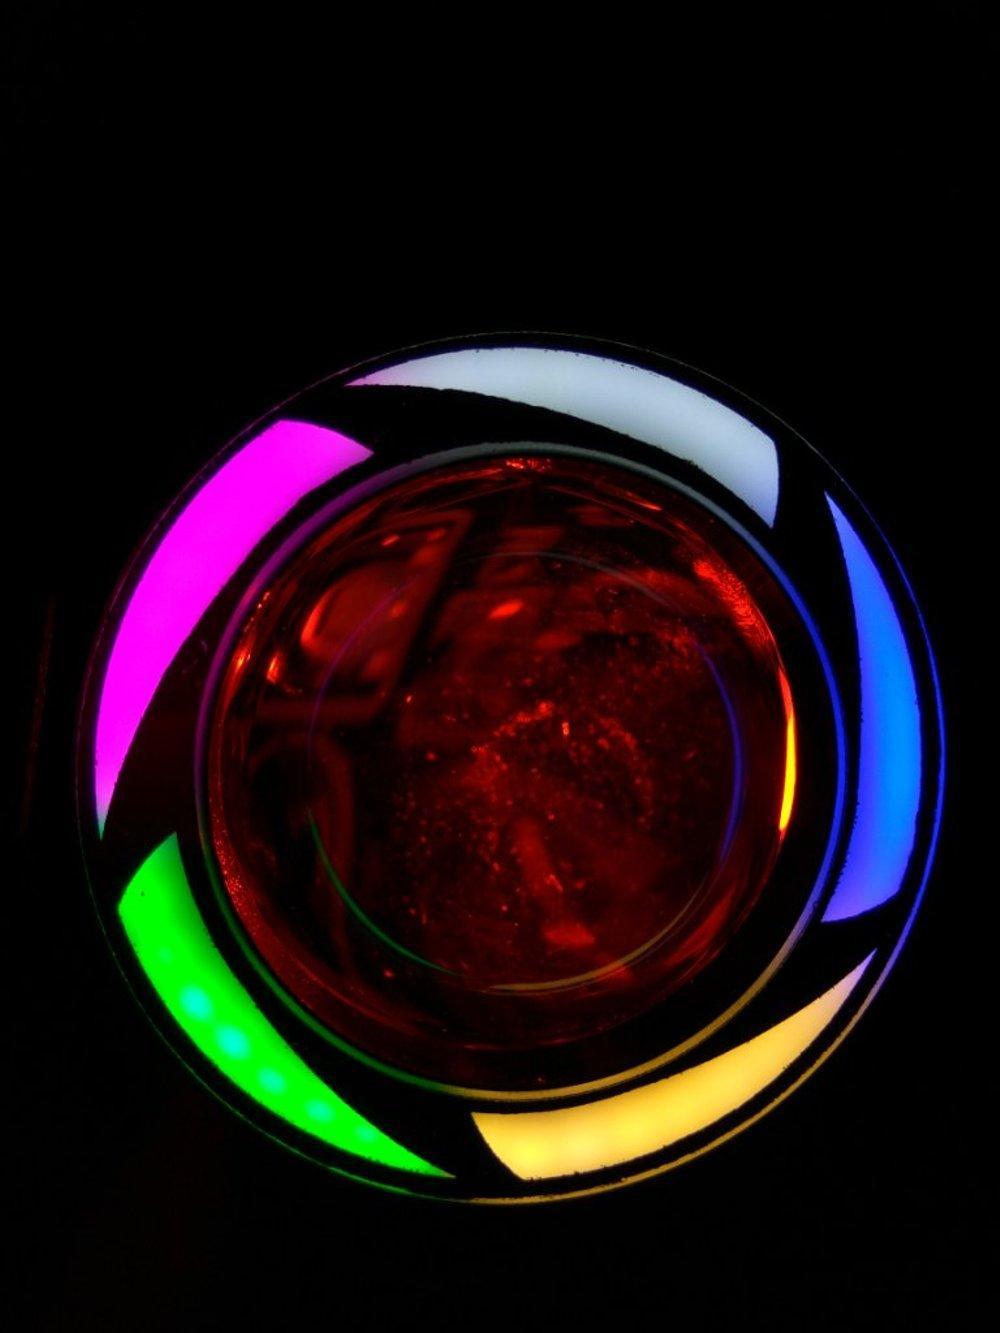 Beli Cree U7 Lampu Sorot Motor Dengan Angel Eyes Tembak Led Transformer Rainbow Pelangi Ae Dan De